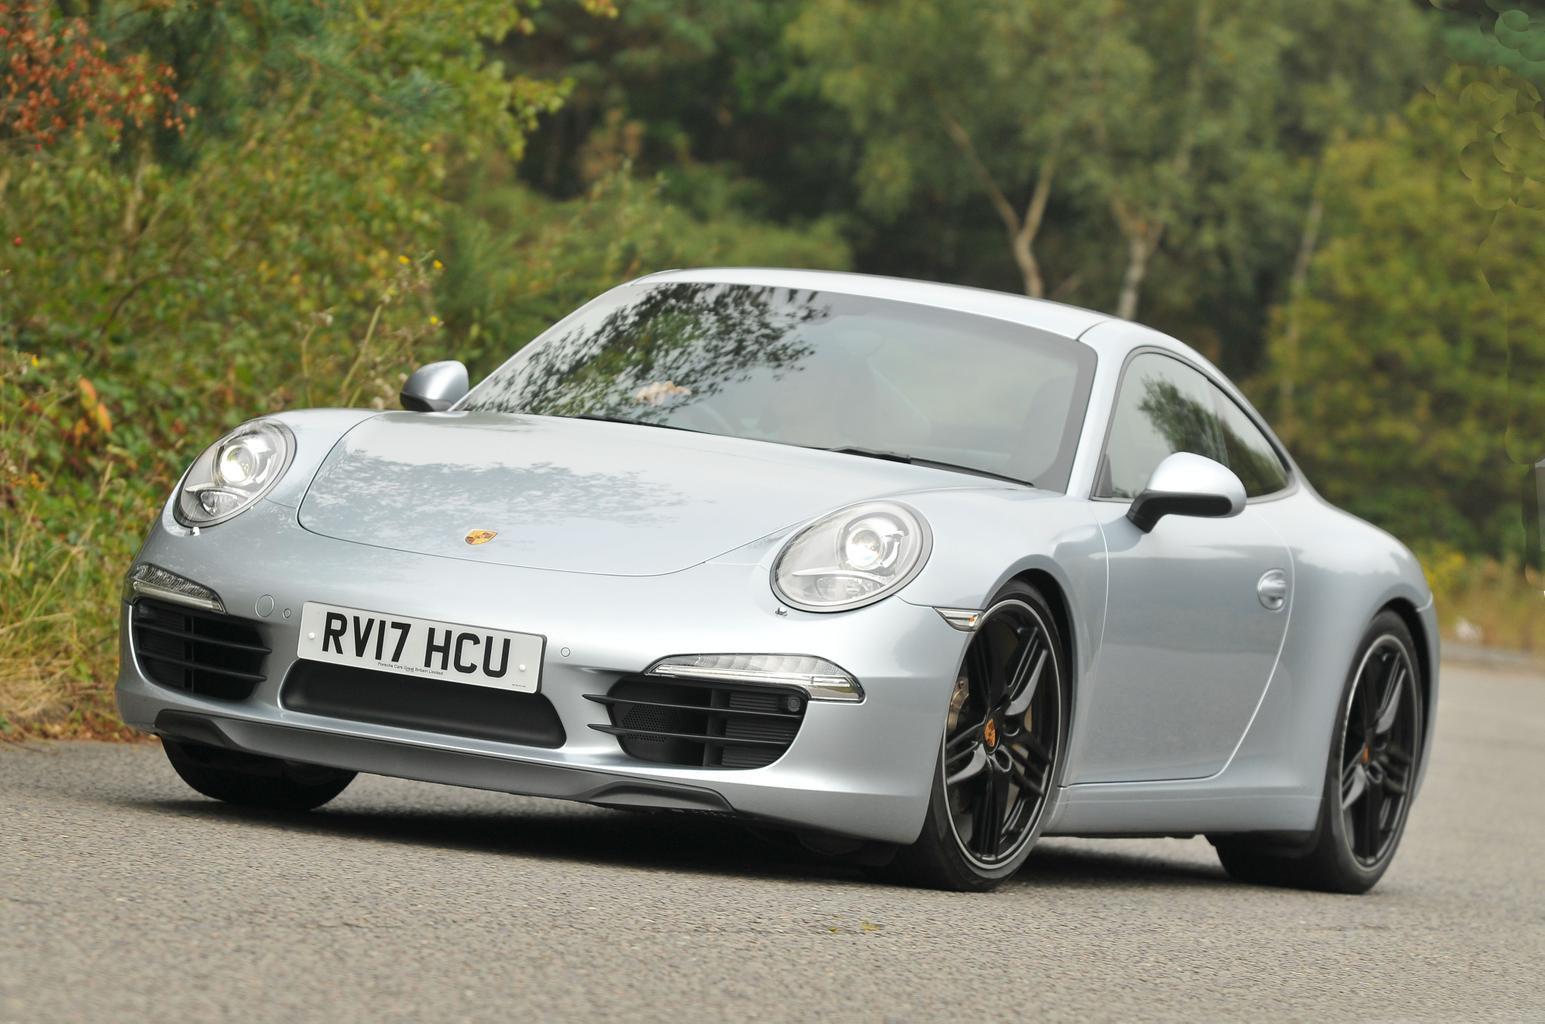 Bmw I8 Vs Porsche 911 What Car